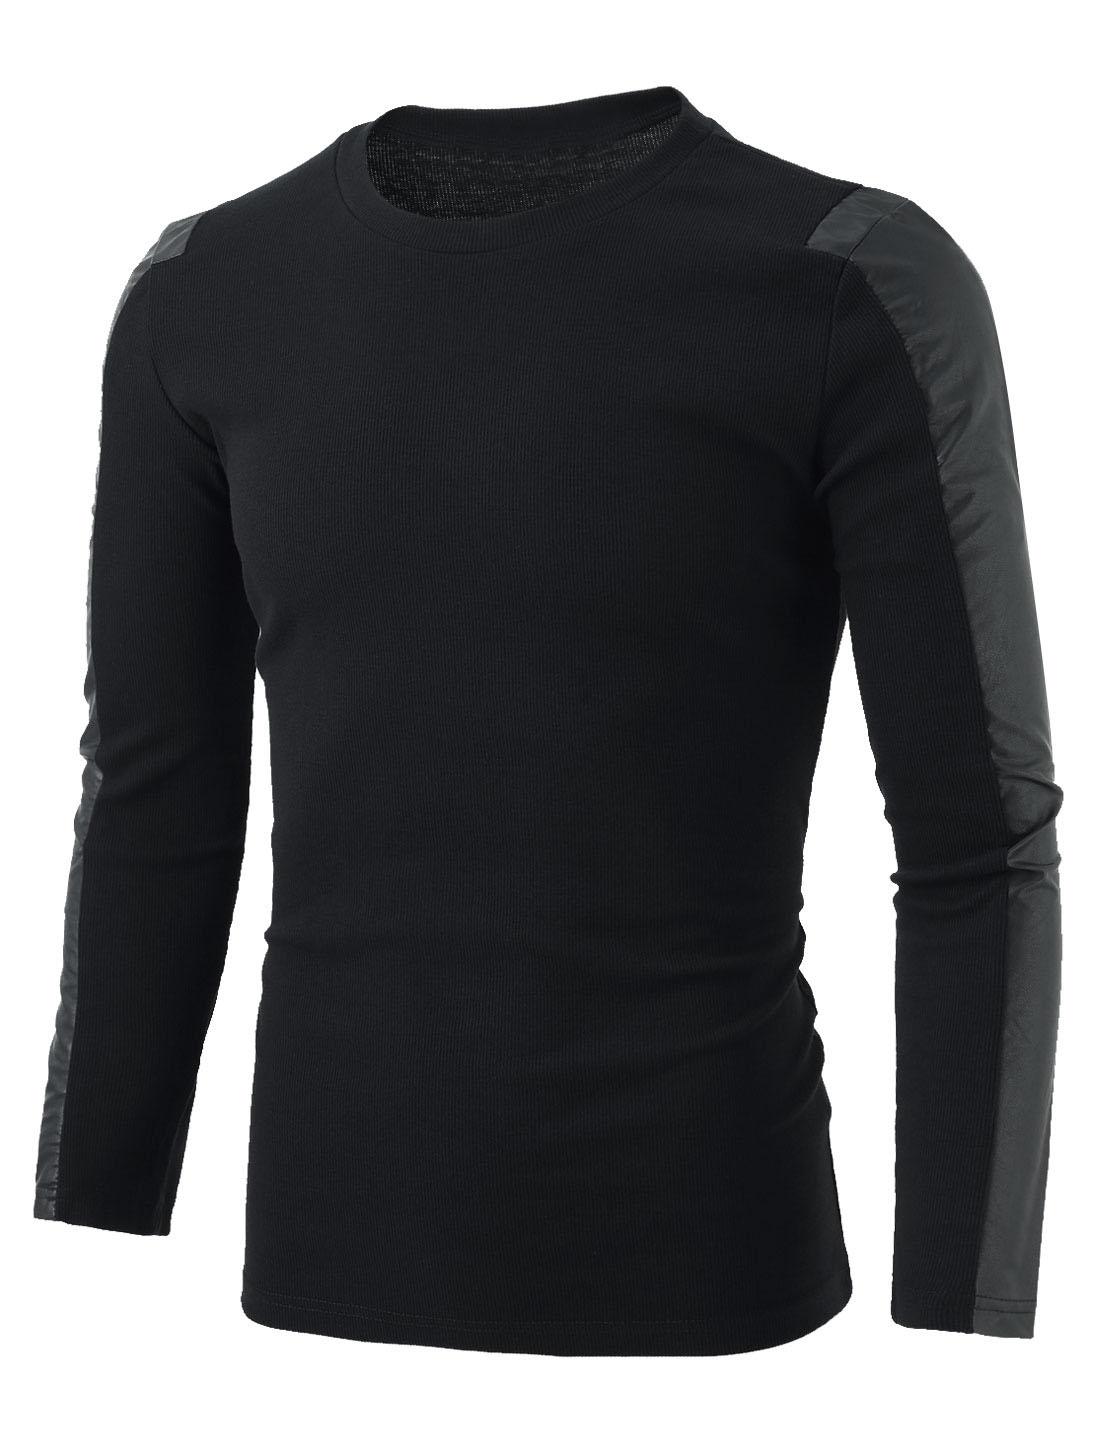 Men Imitation Leather Panel Ribbed Design Slim Shirt Black S